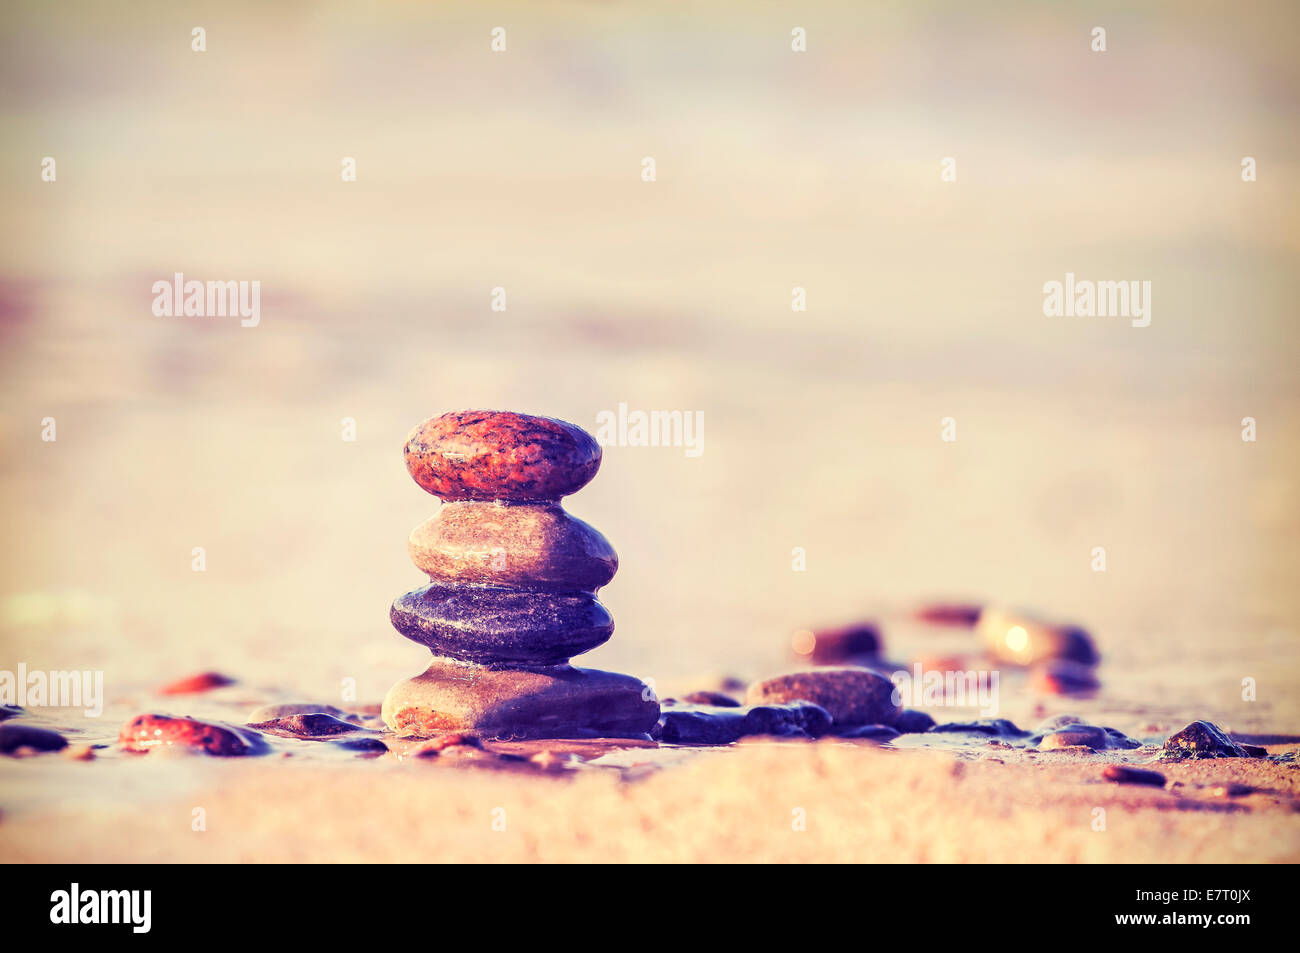 Vintage retro style image of stones on beach. - Stock Image